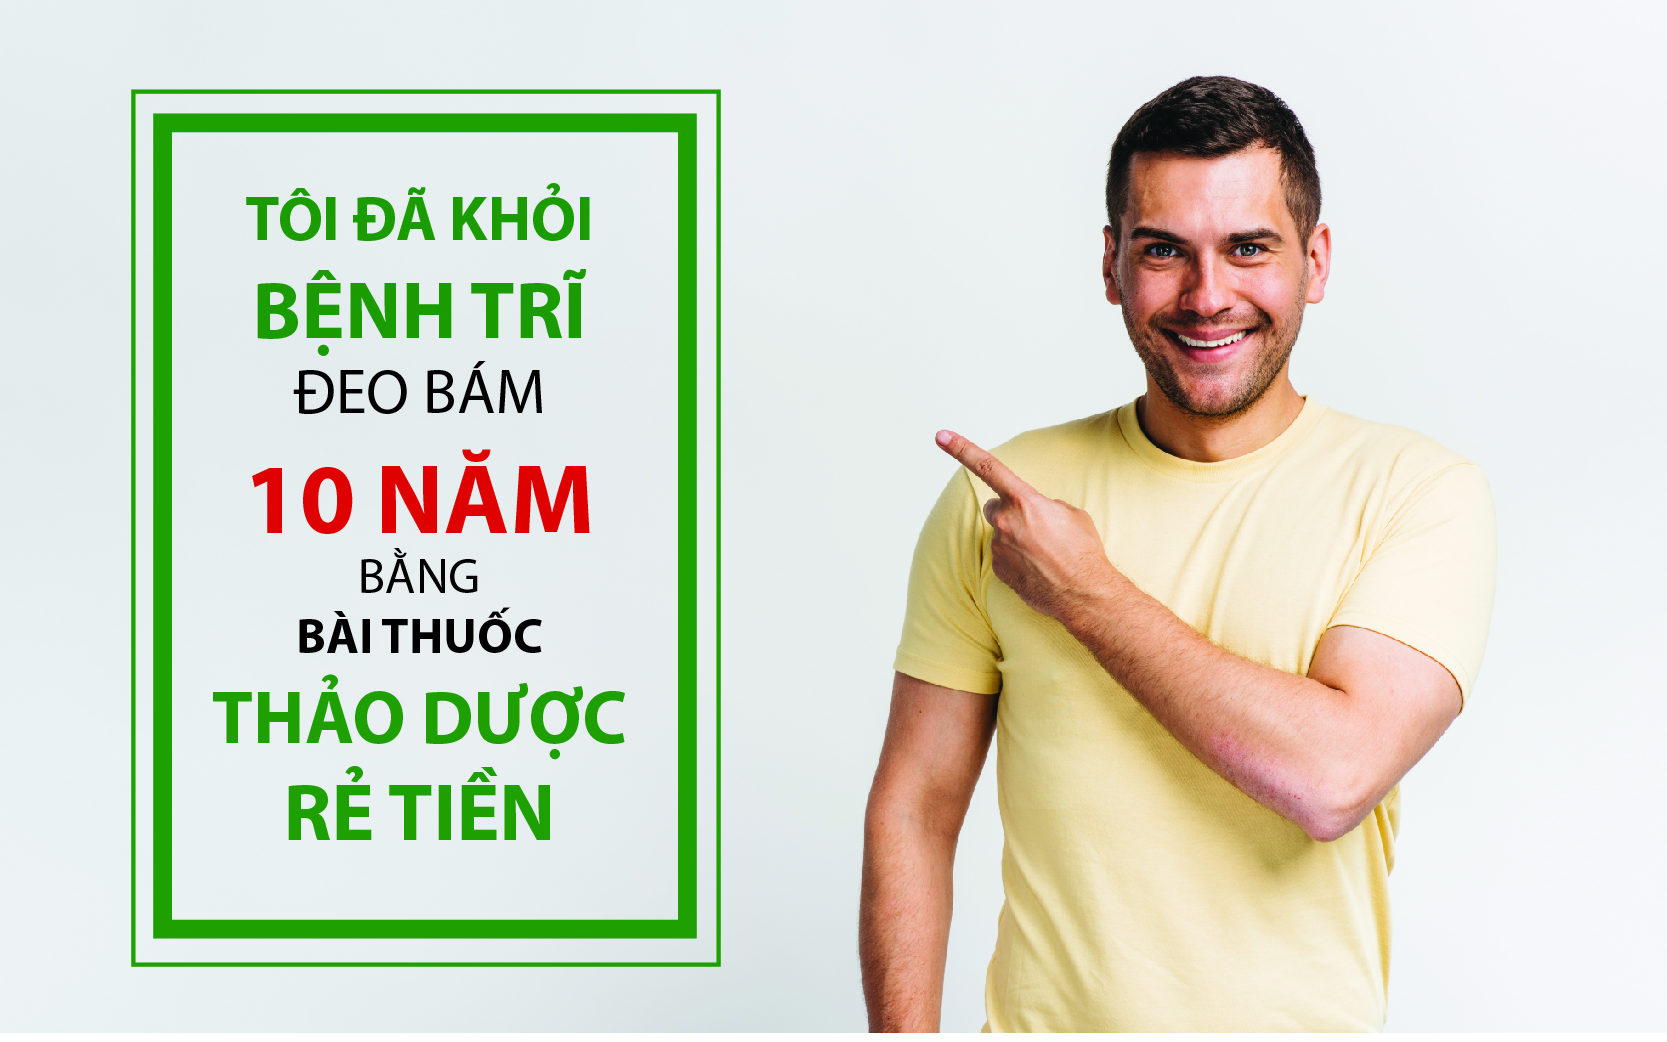 toi-da-khoi-benh-tri-deo-bam-10-nam-bang-bai-thuoc-thao-duoc-re-tien